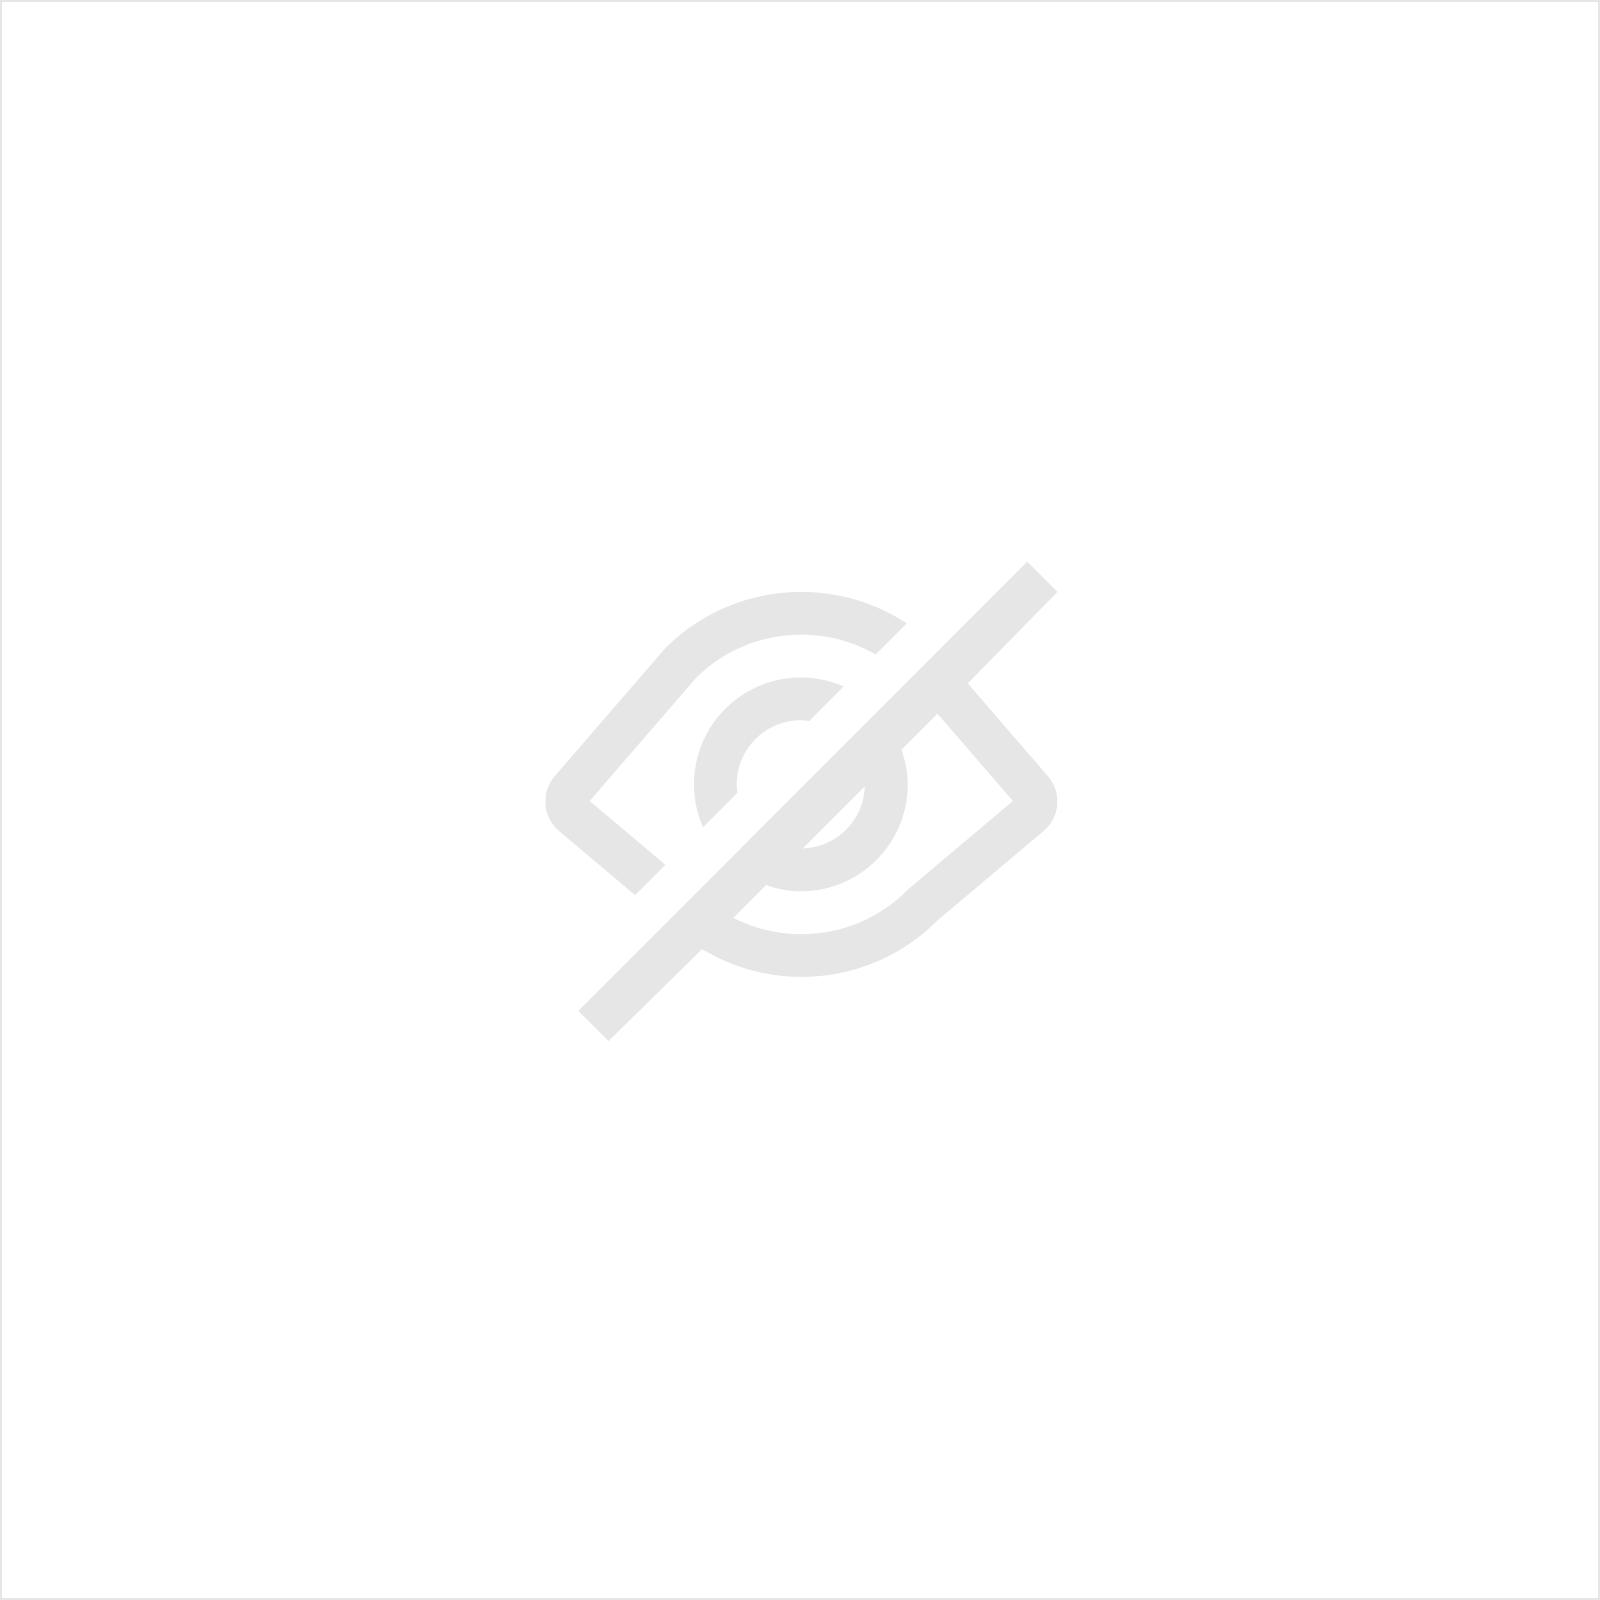 MEGUIAR'S DA POWER SYSTEEM COMPOUND POWER PACK (G3501)